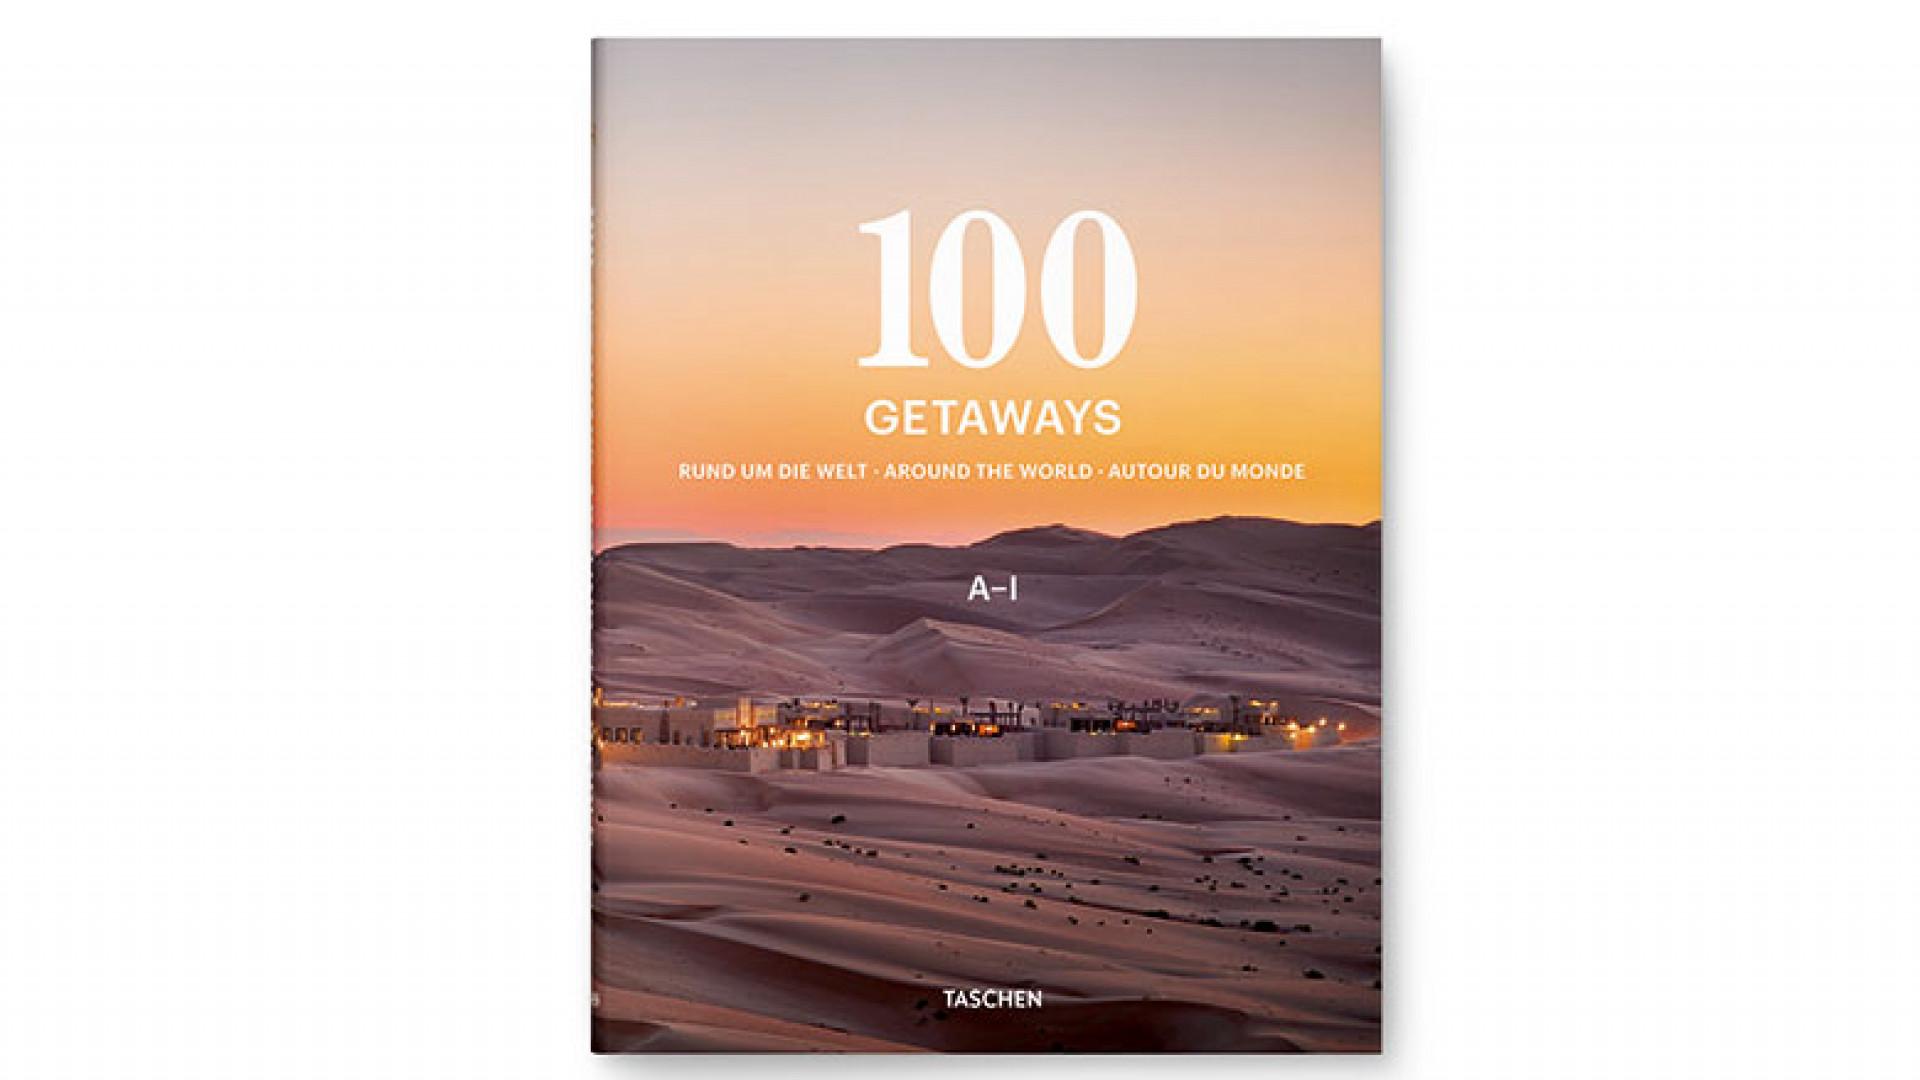 ju_25_100_getaways_around_the_world_vol1